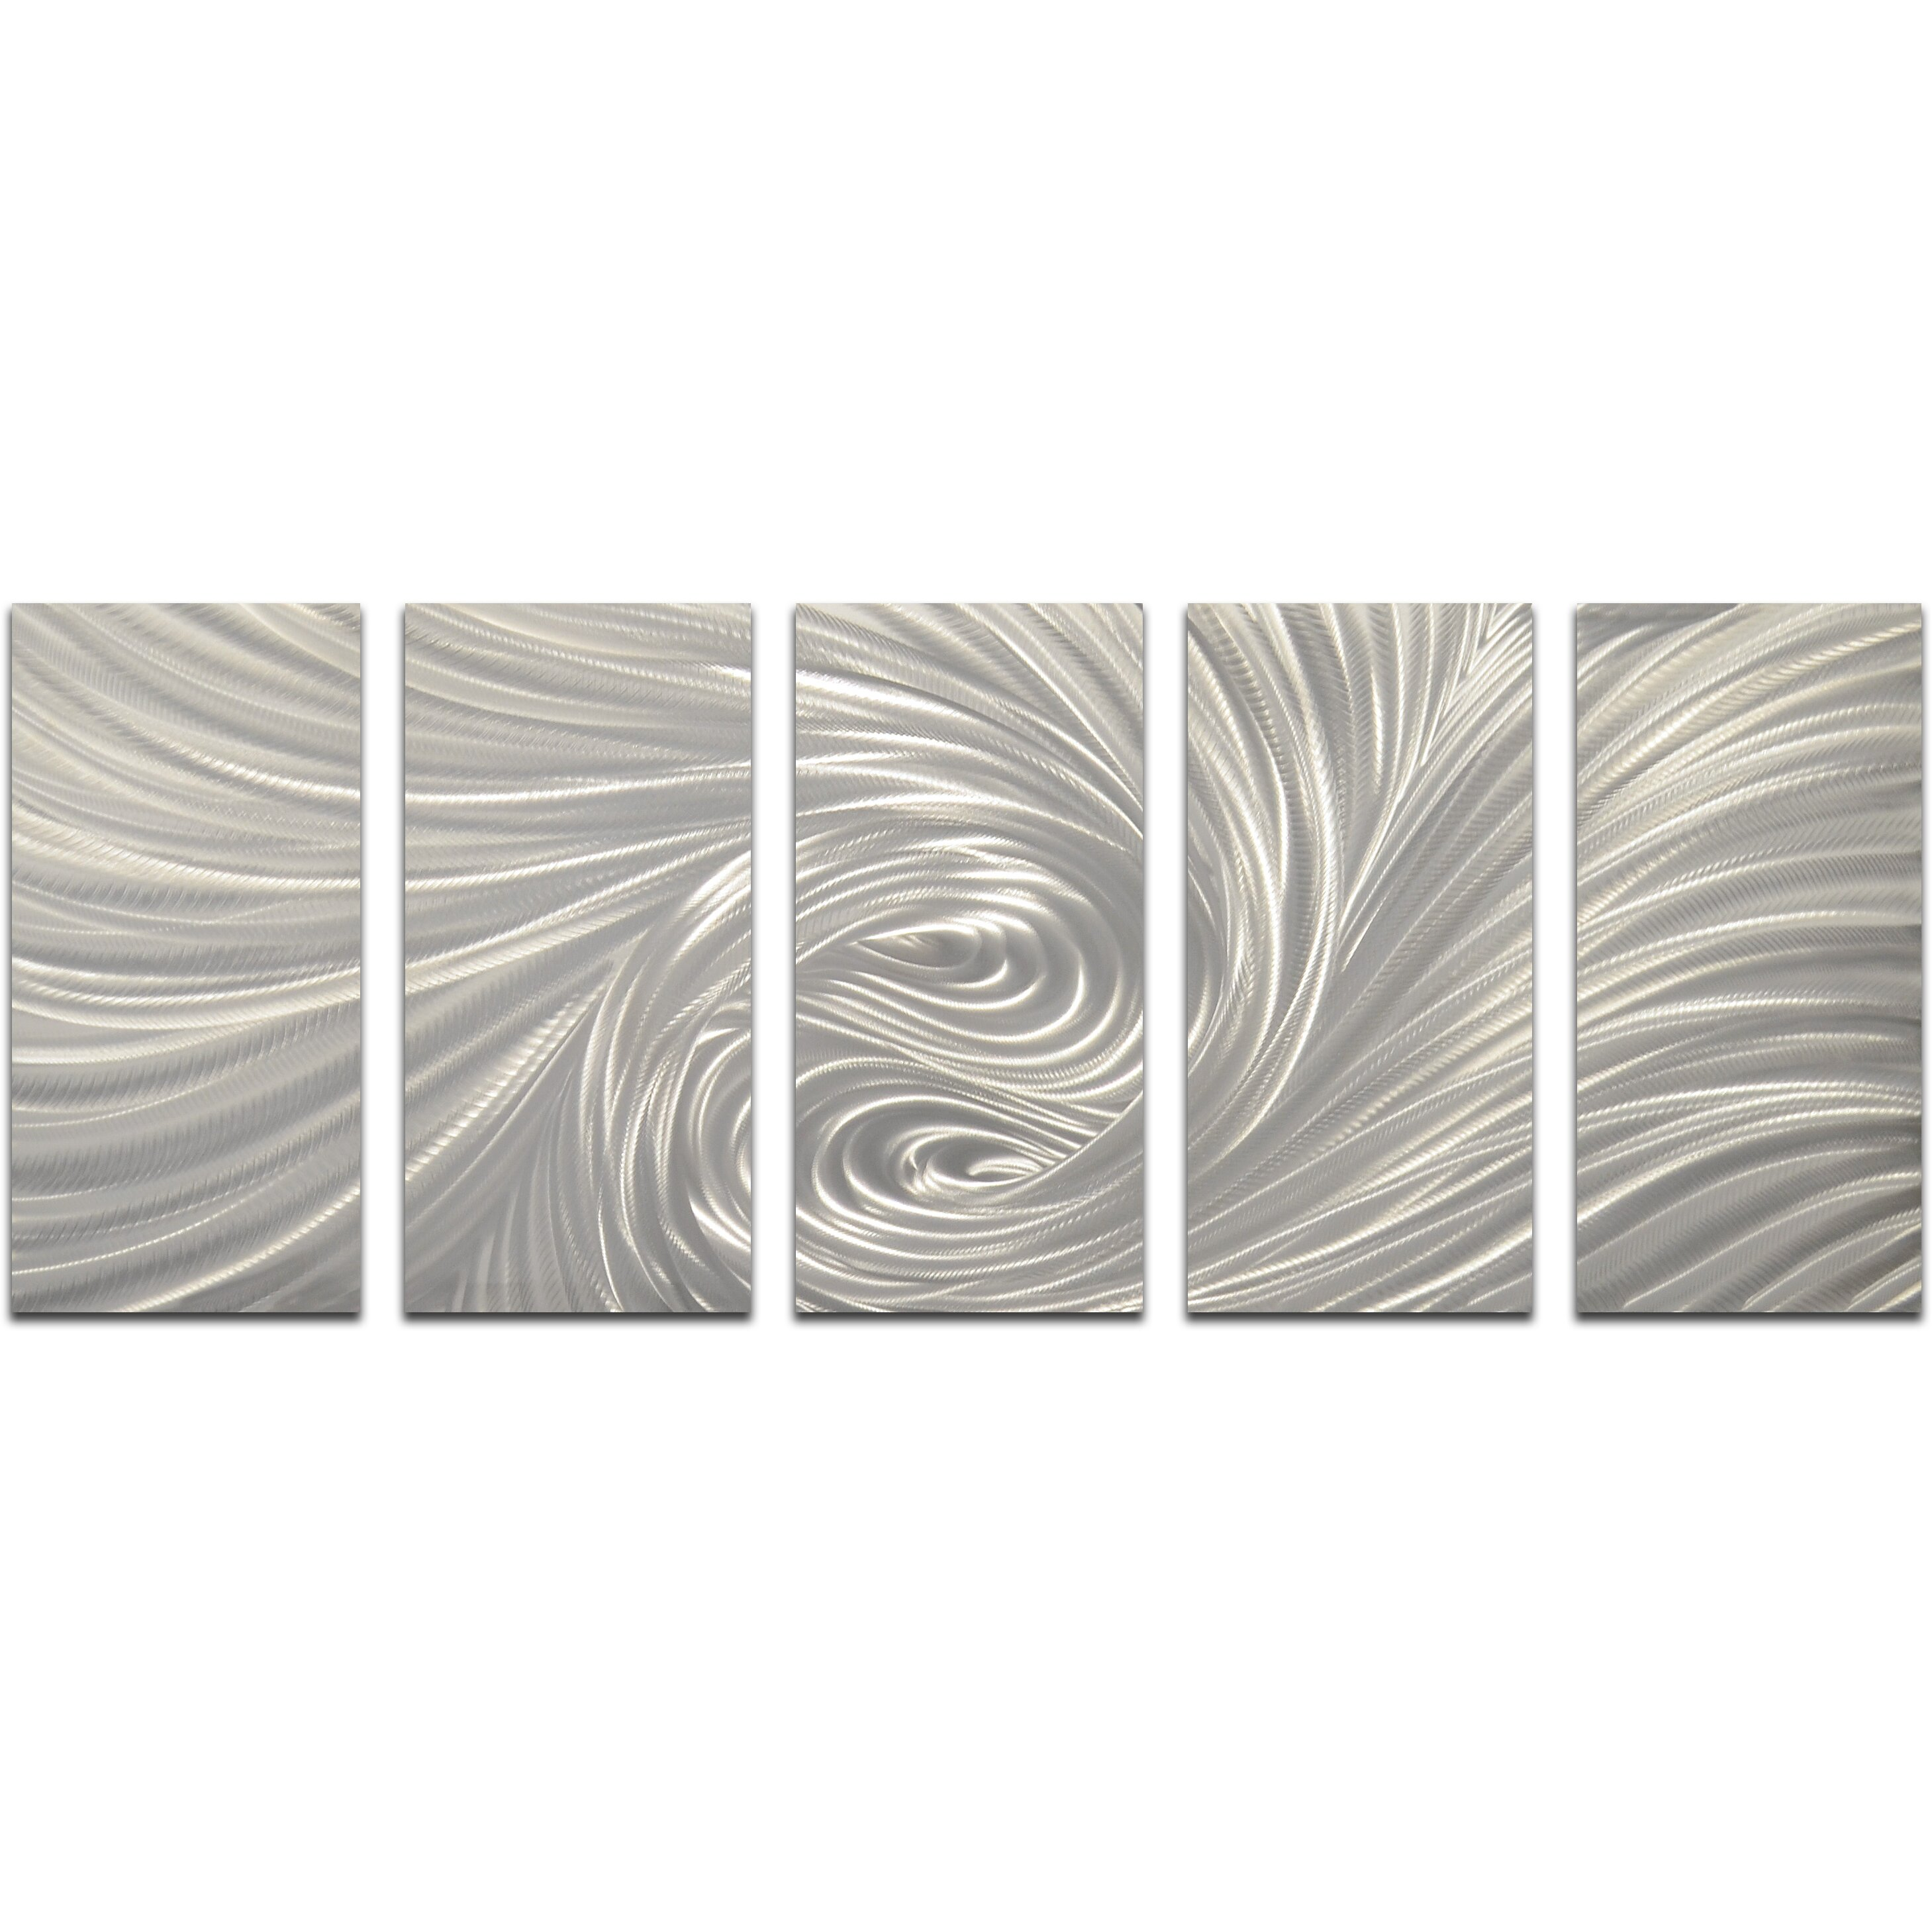 Wall Decor Set Of 5 : Omax decor piece velvety greys wall d?cor set wayfair